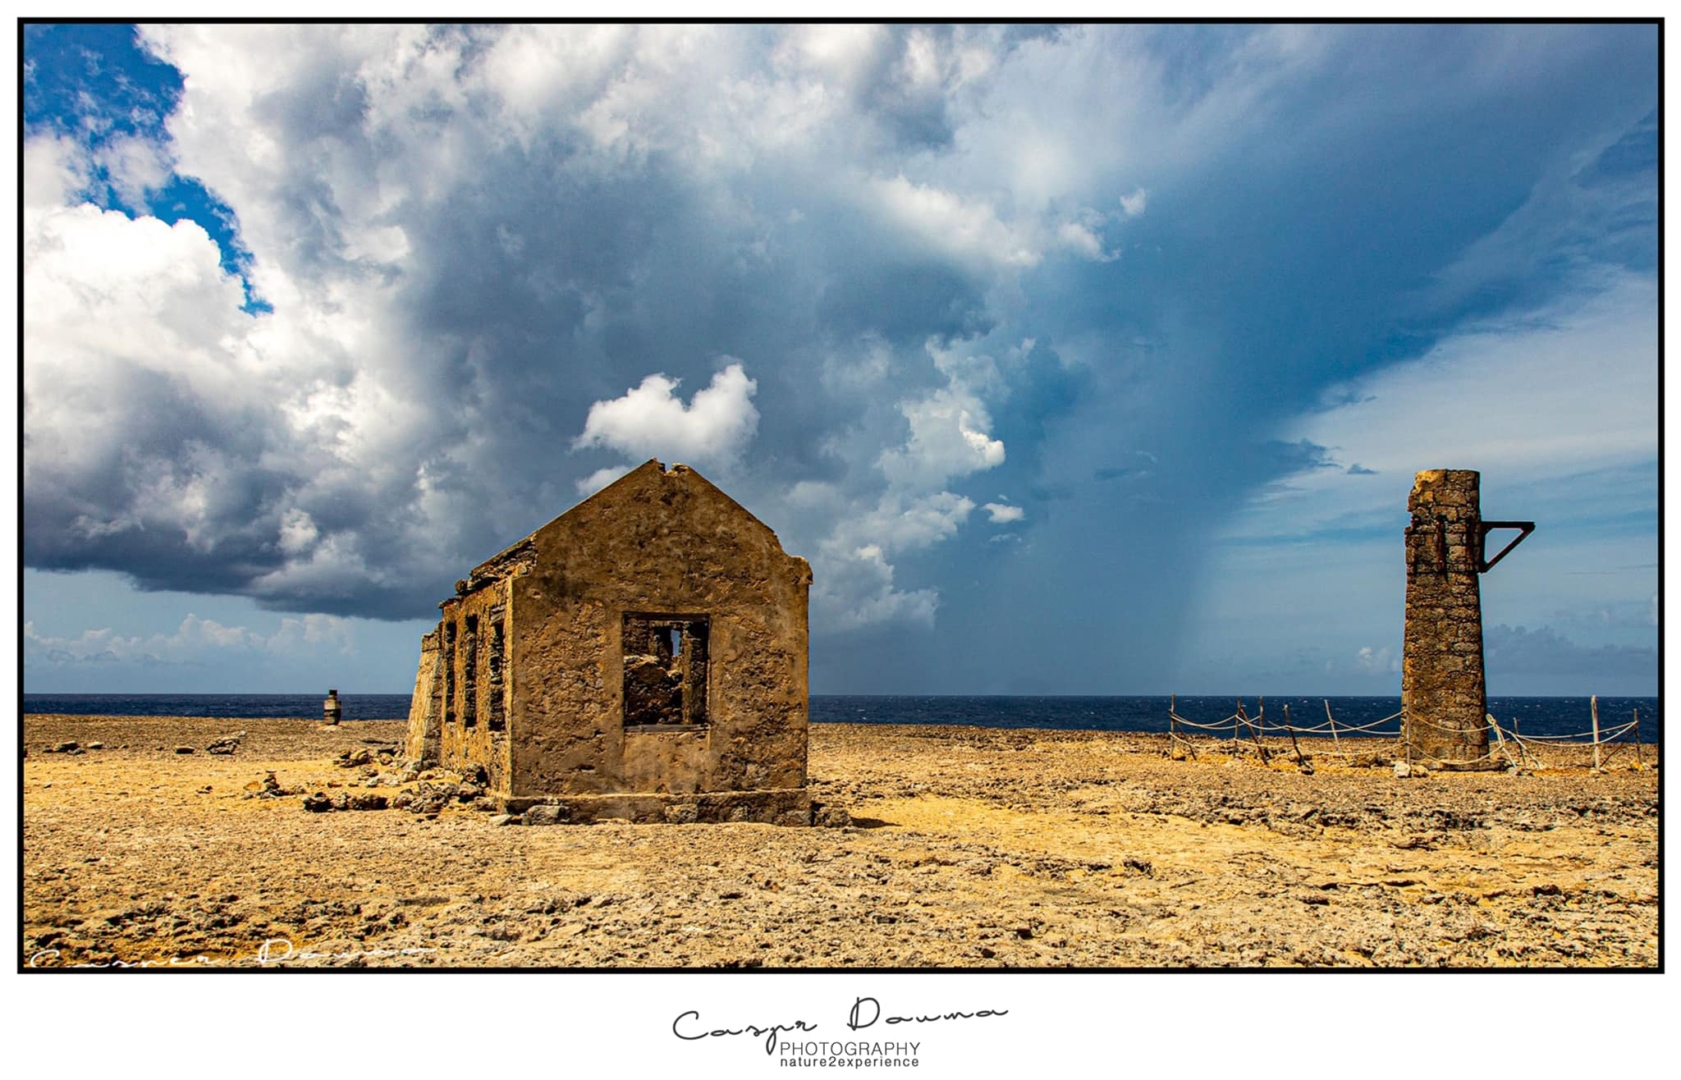 Casper Douma - Malmok Bonaire